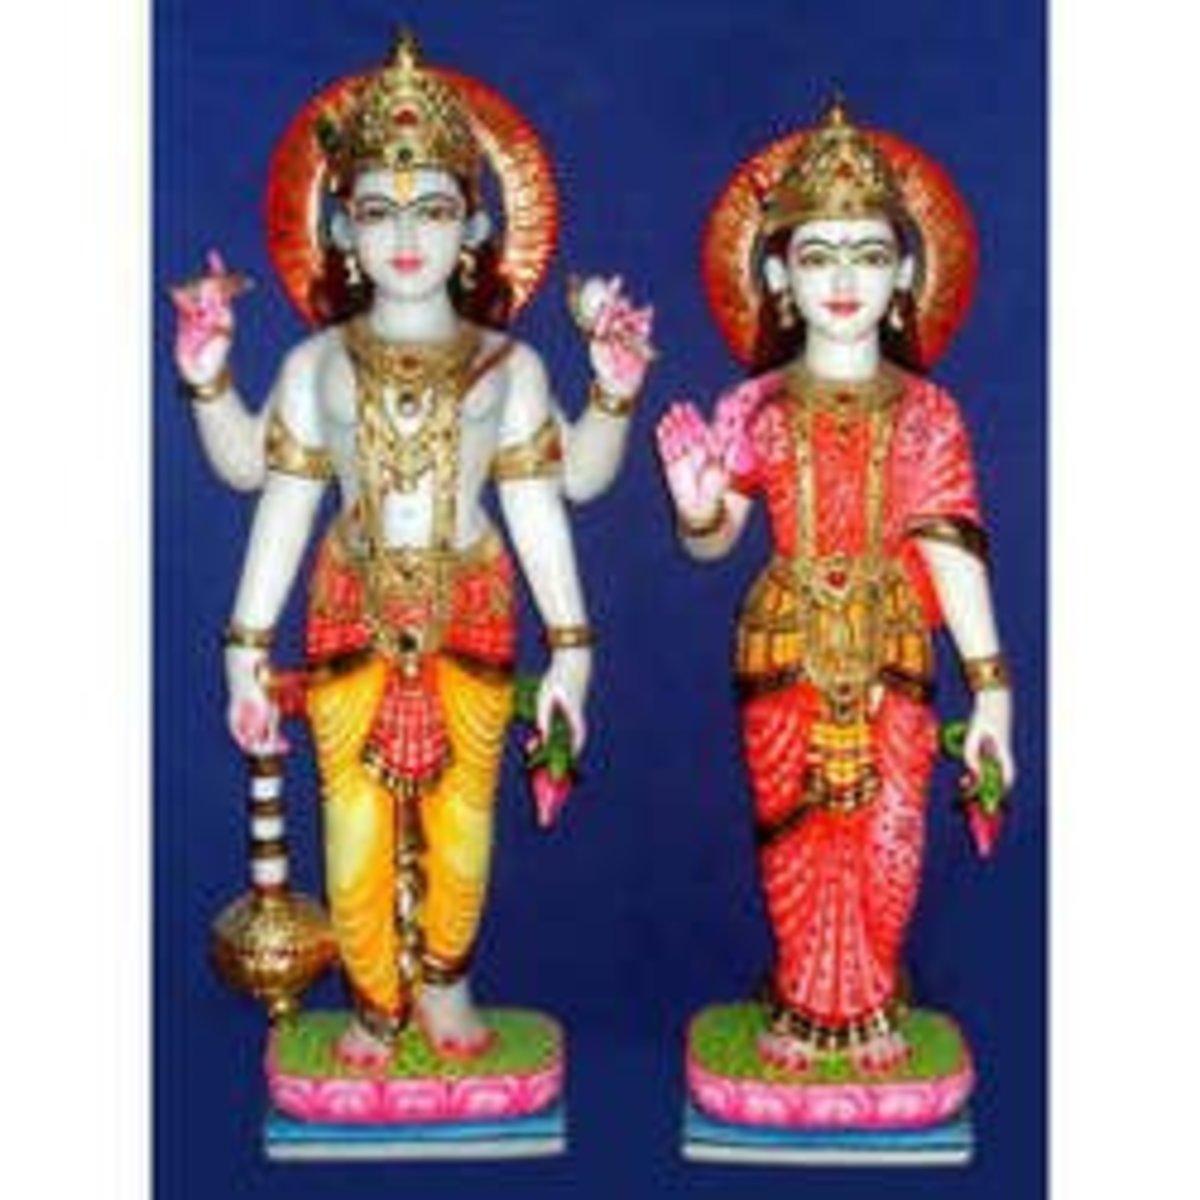 Laxmi Narayan doll